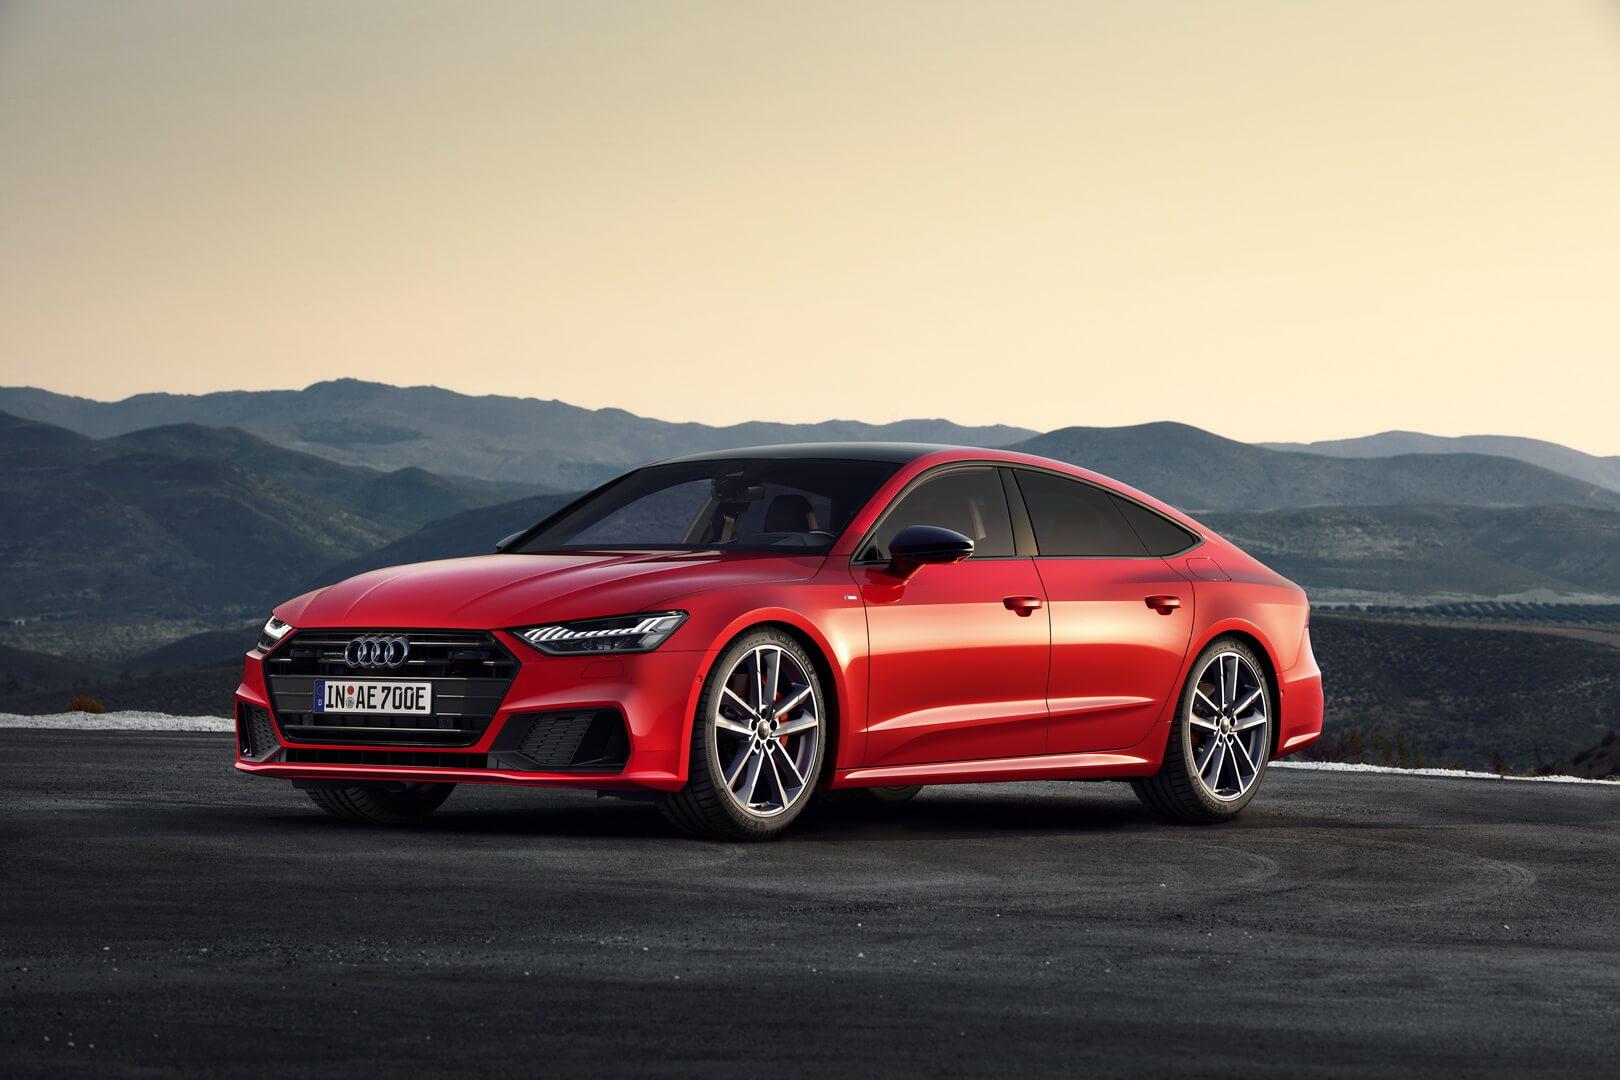 Audi A7Sportback 55TFSI equattro